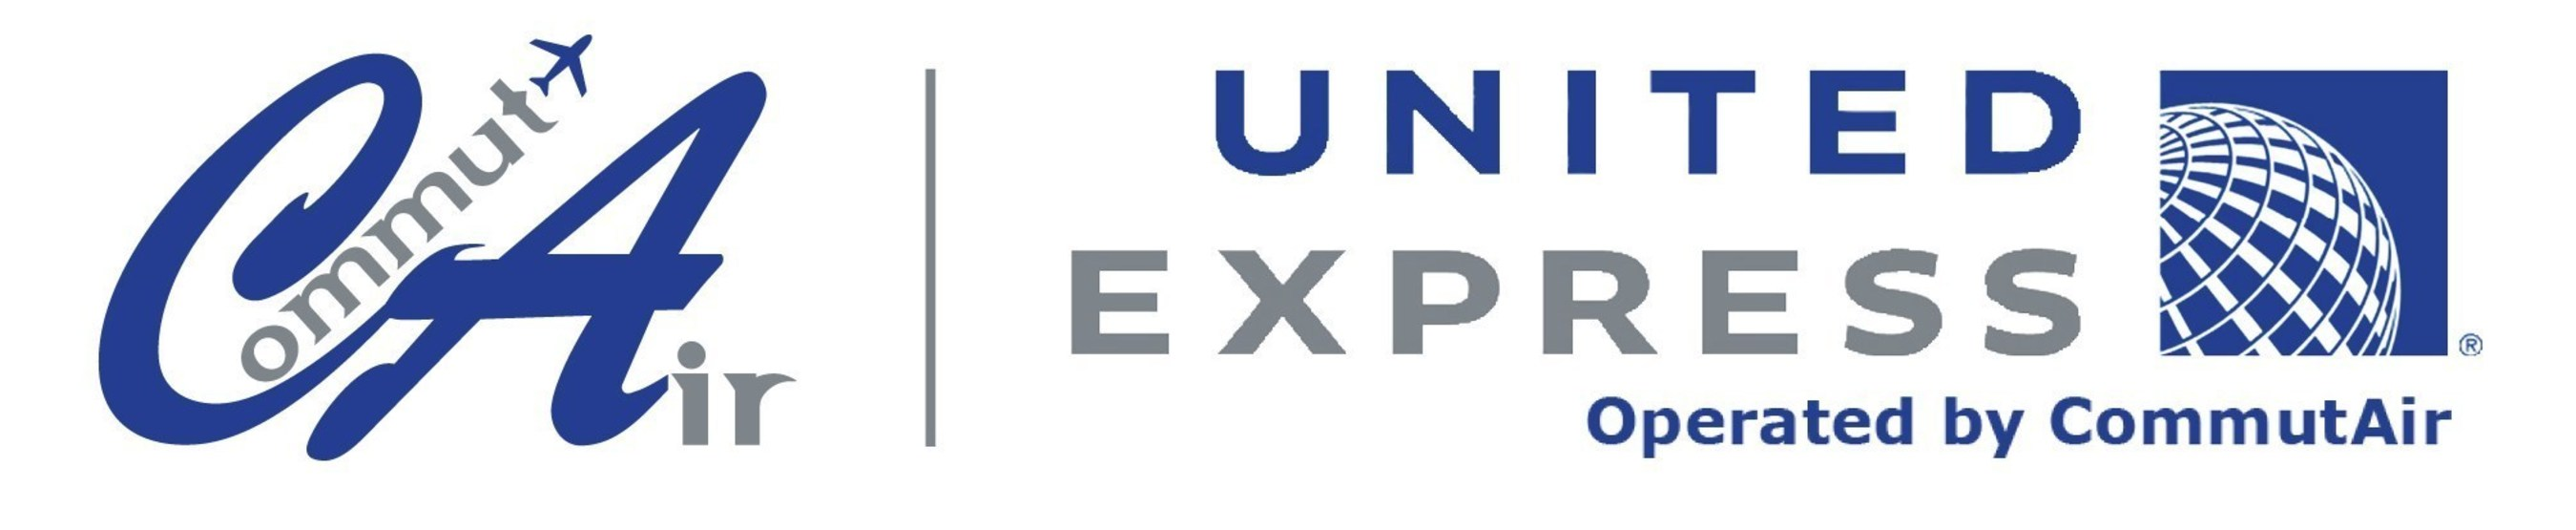 CommutAir dba United Express